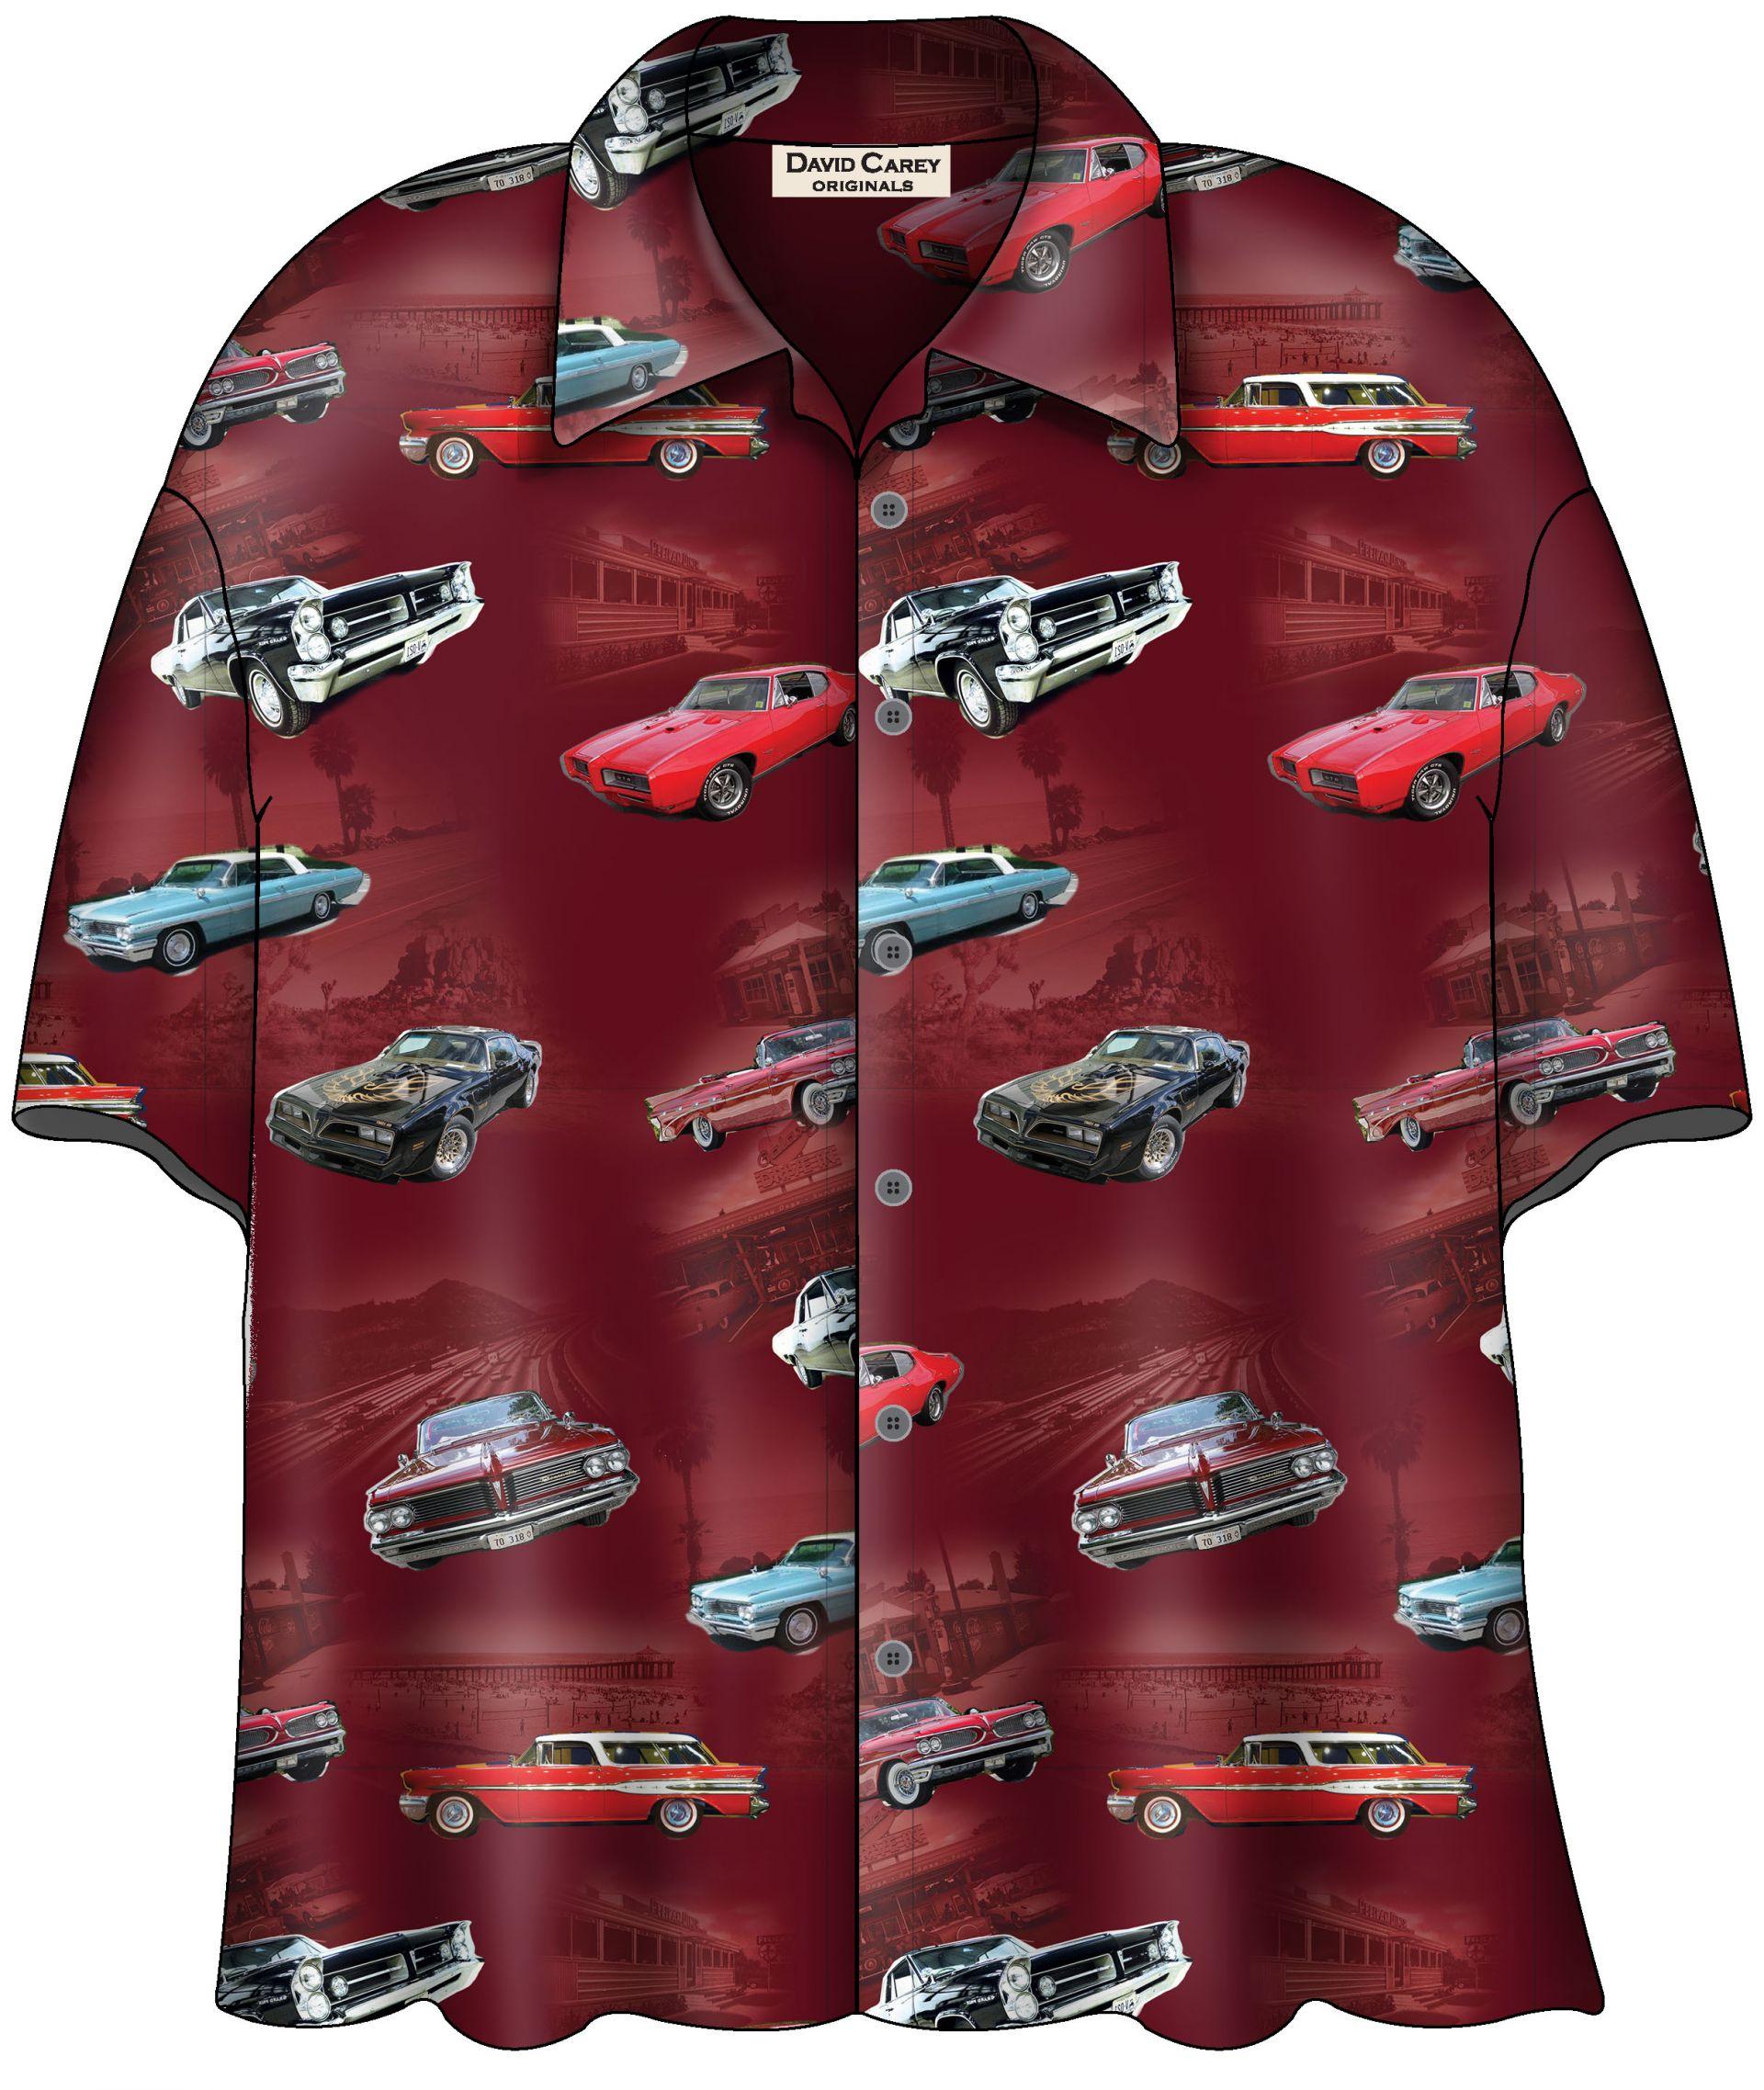 Pontiac Classics Camp Shirt Licensed by General Motors